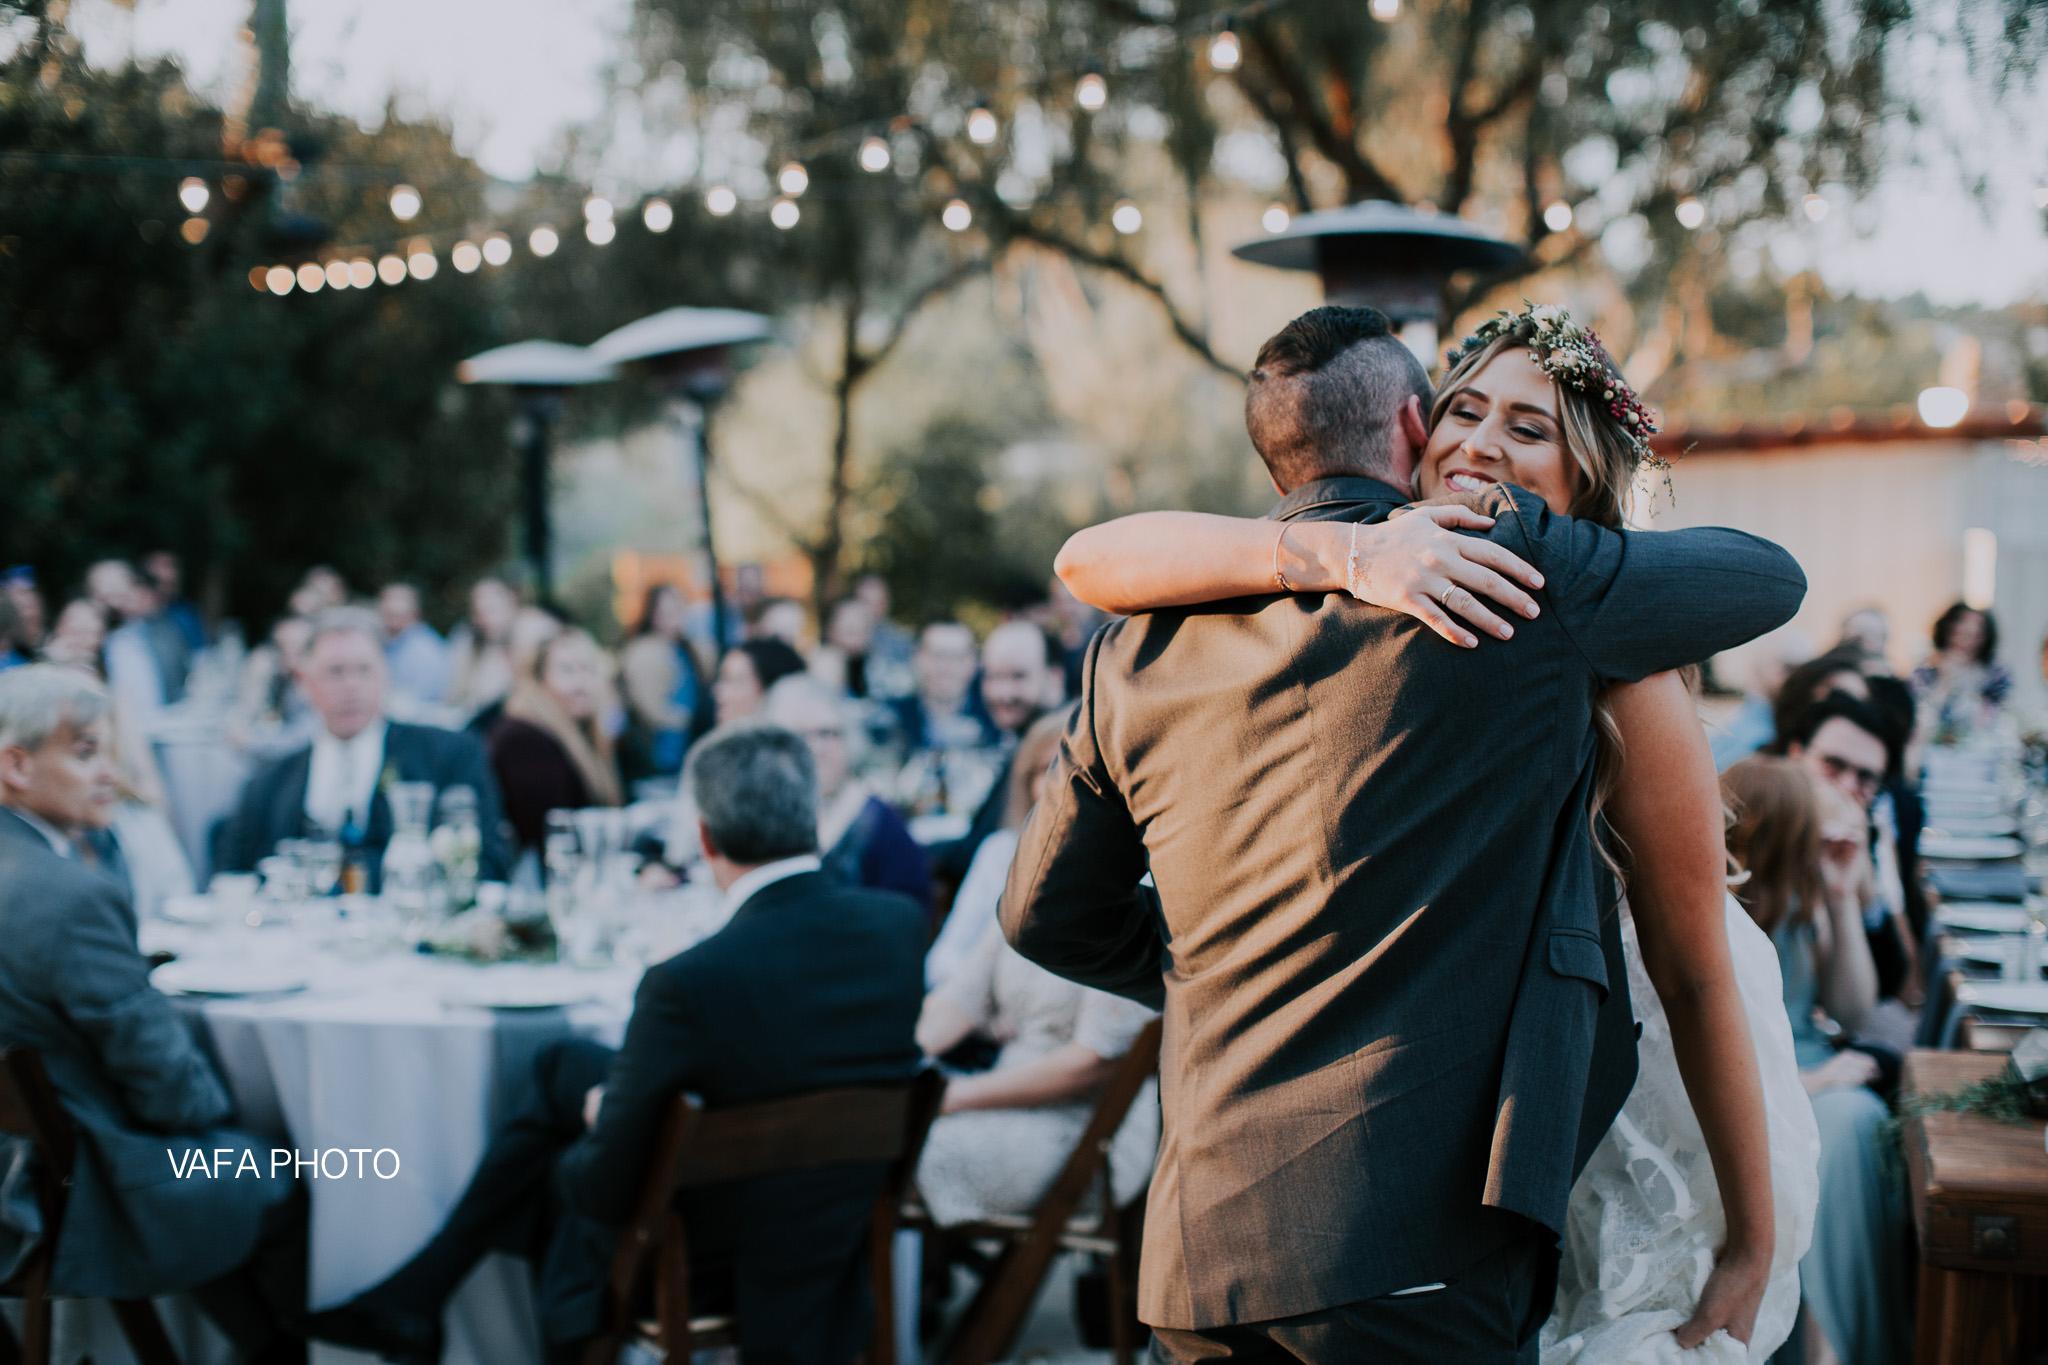 Leo-Carrillo-Ranch-Wedding-Lauren-Mike-Vafa-Photo-992.jpg